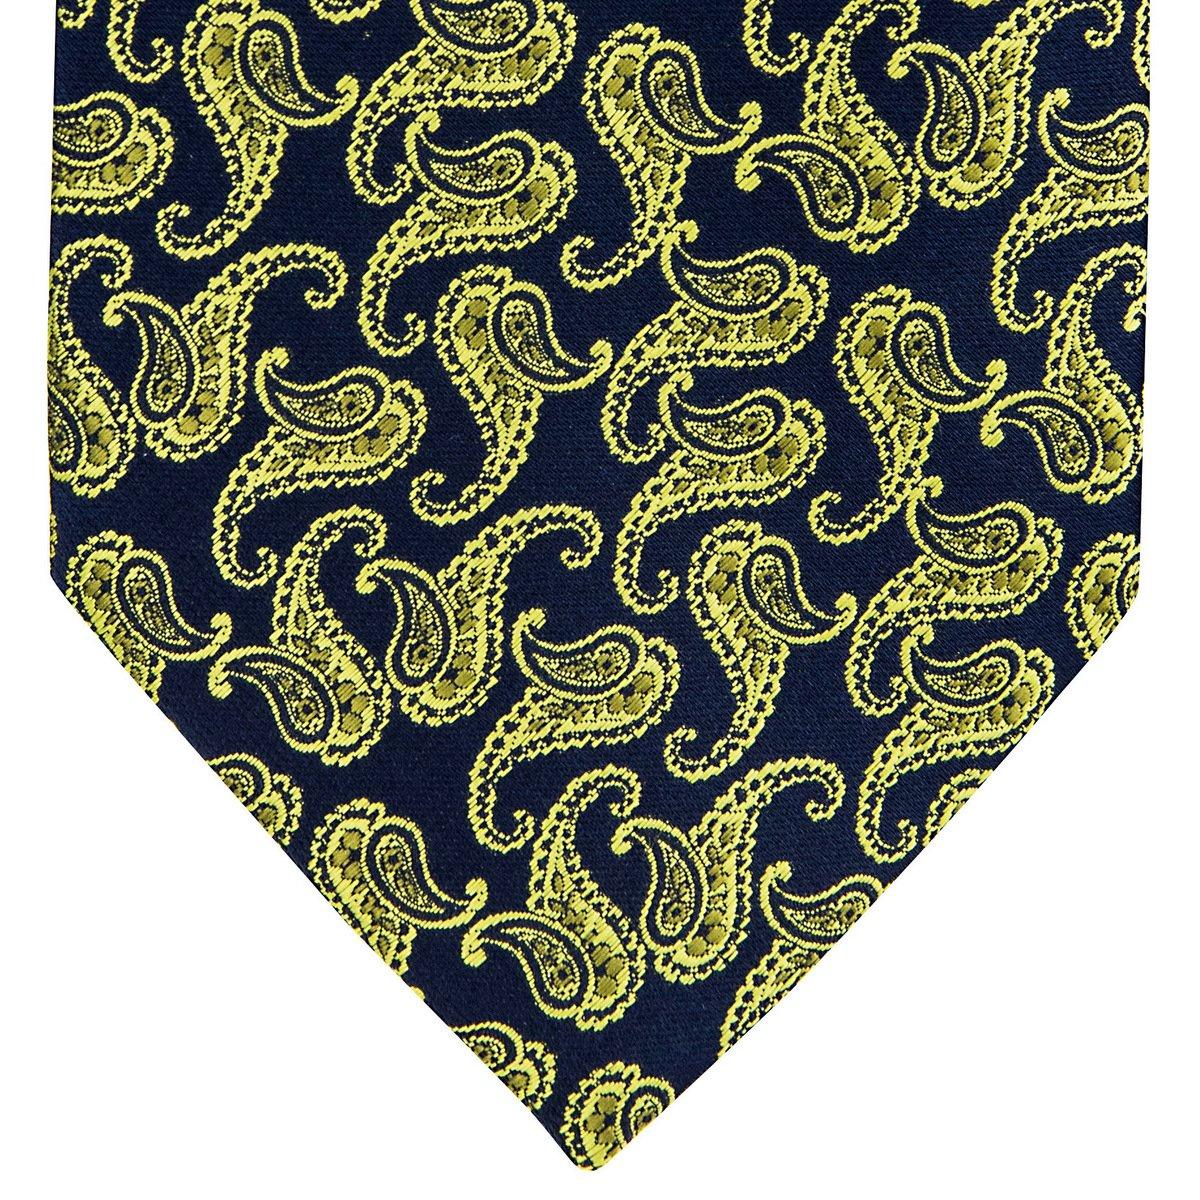 Classic Paisley Pattern Woven Mens Tie Necktie w//Pocket Square /& Cufflinks Gift Set